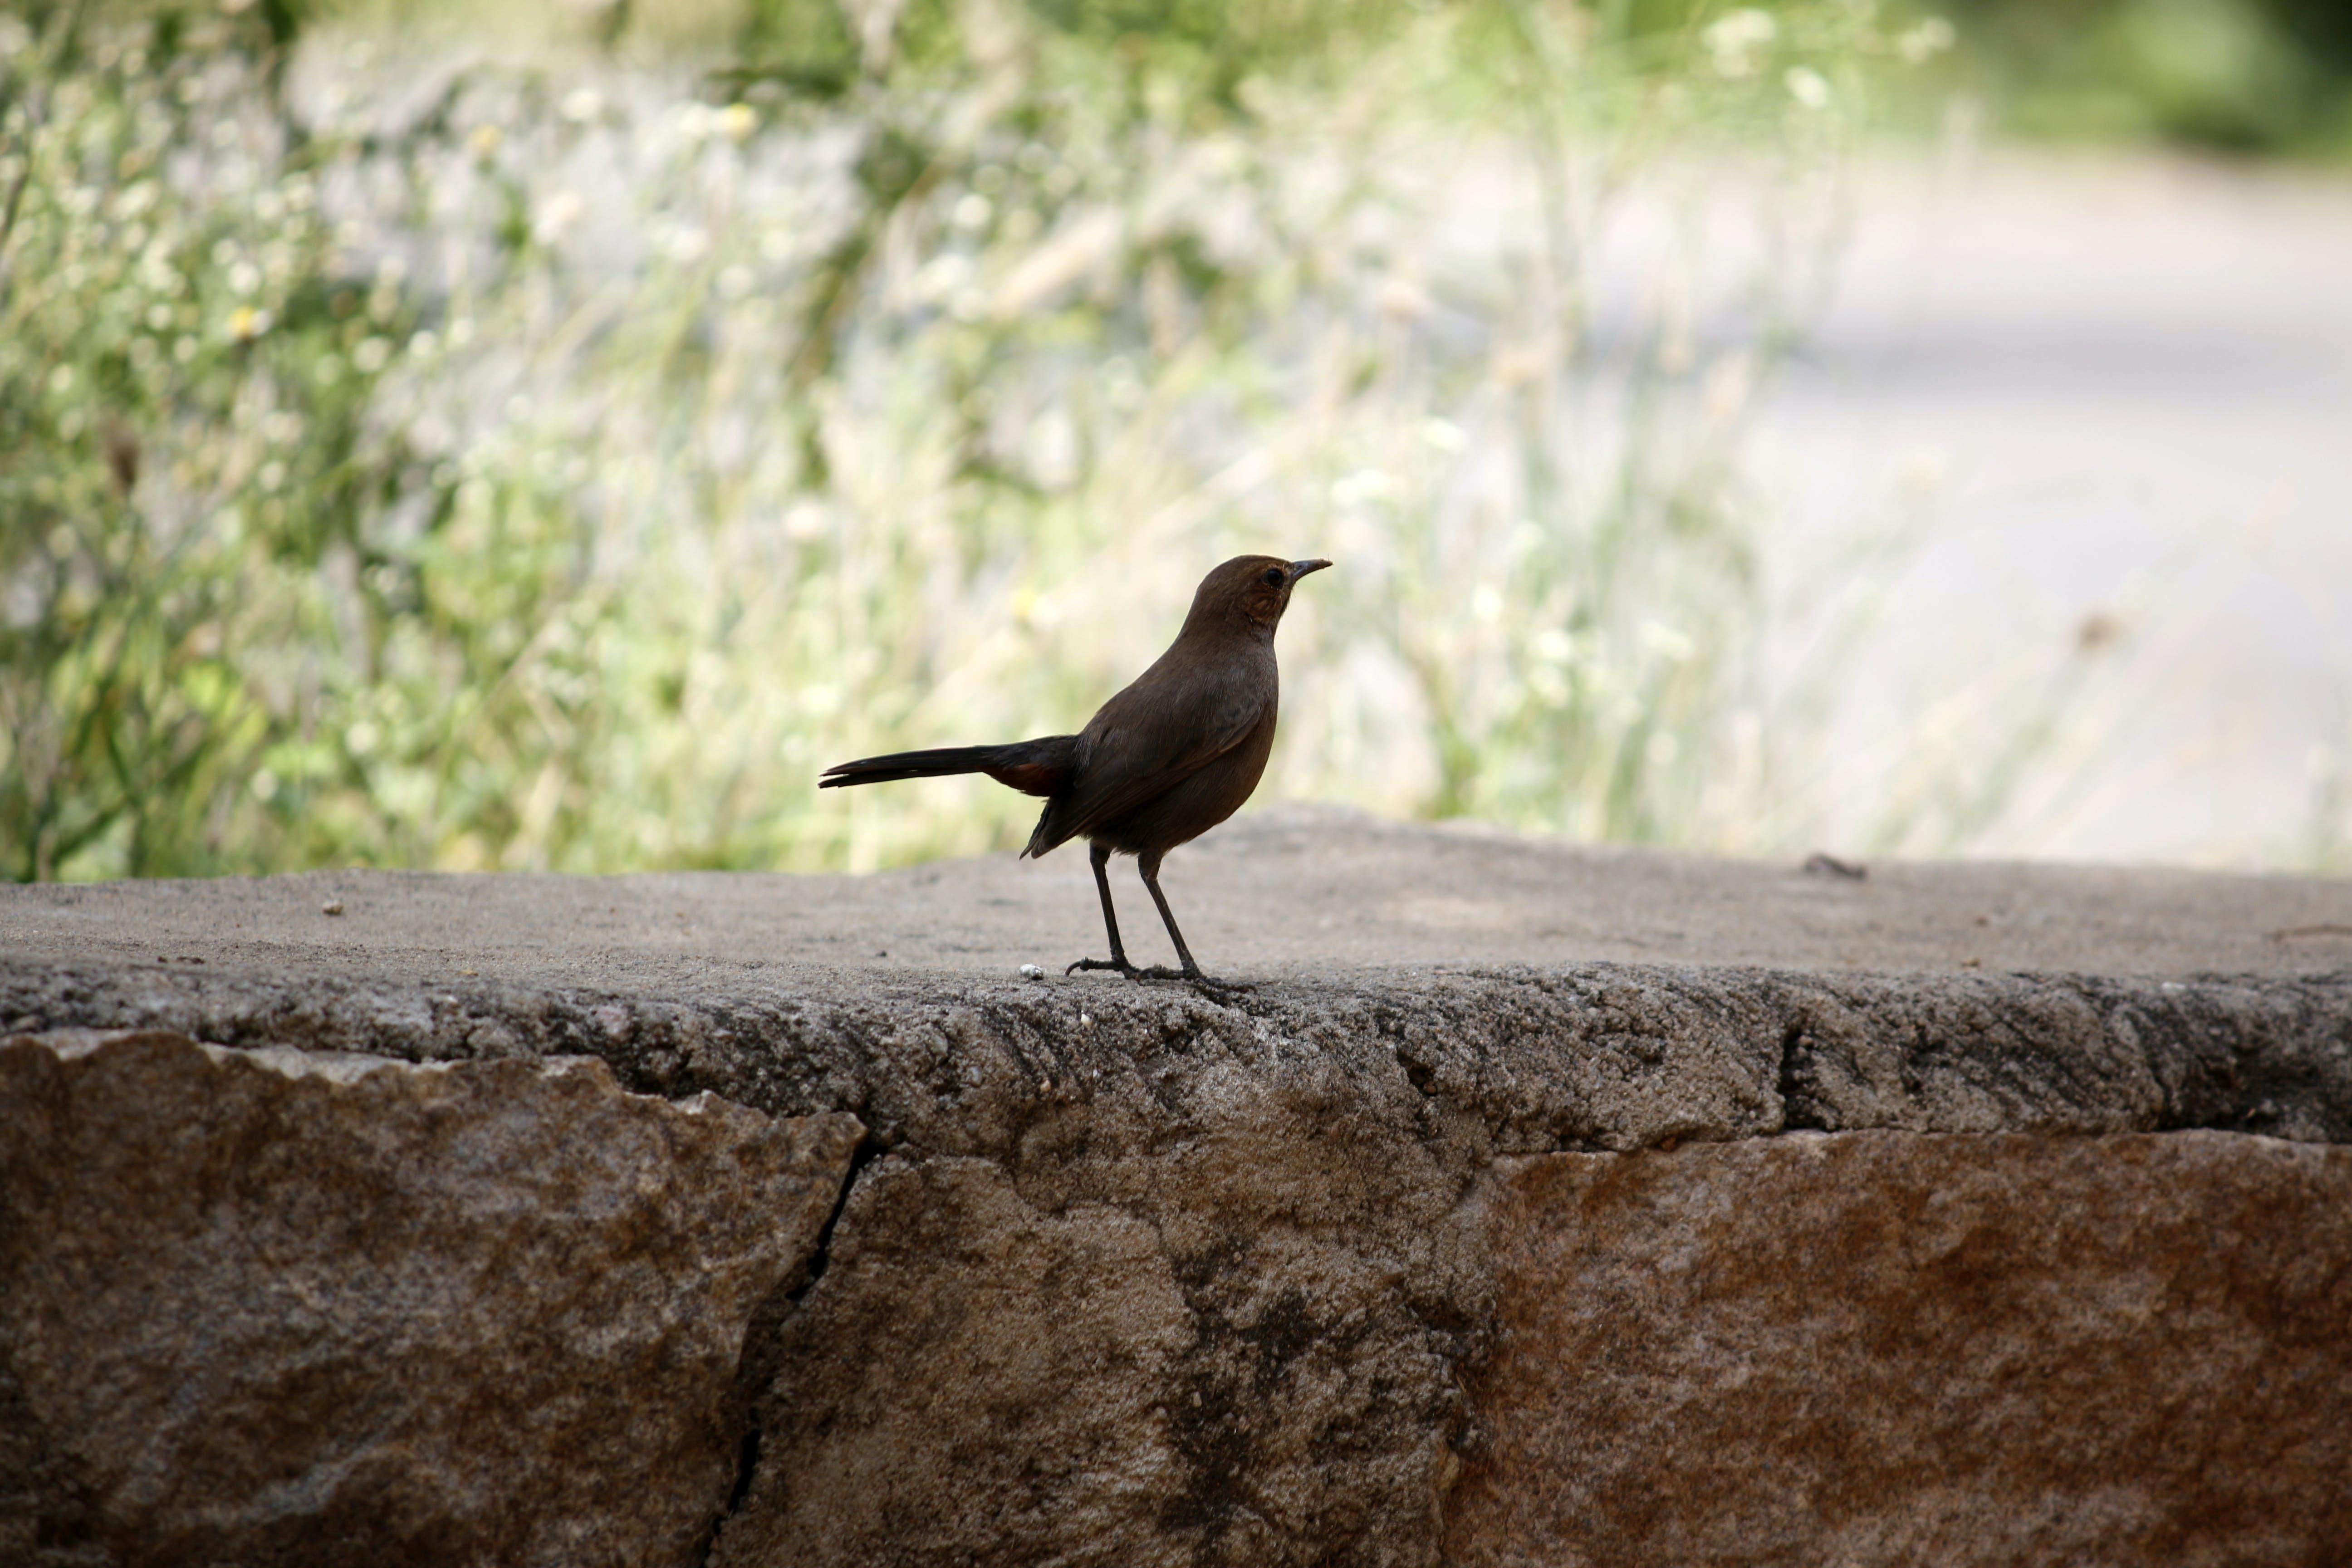 Black Bird on Stone Surface